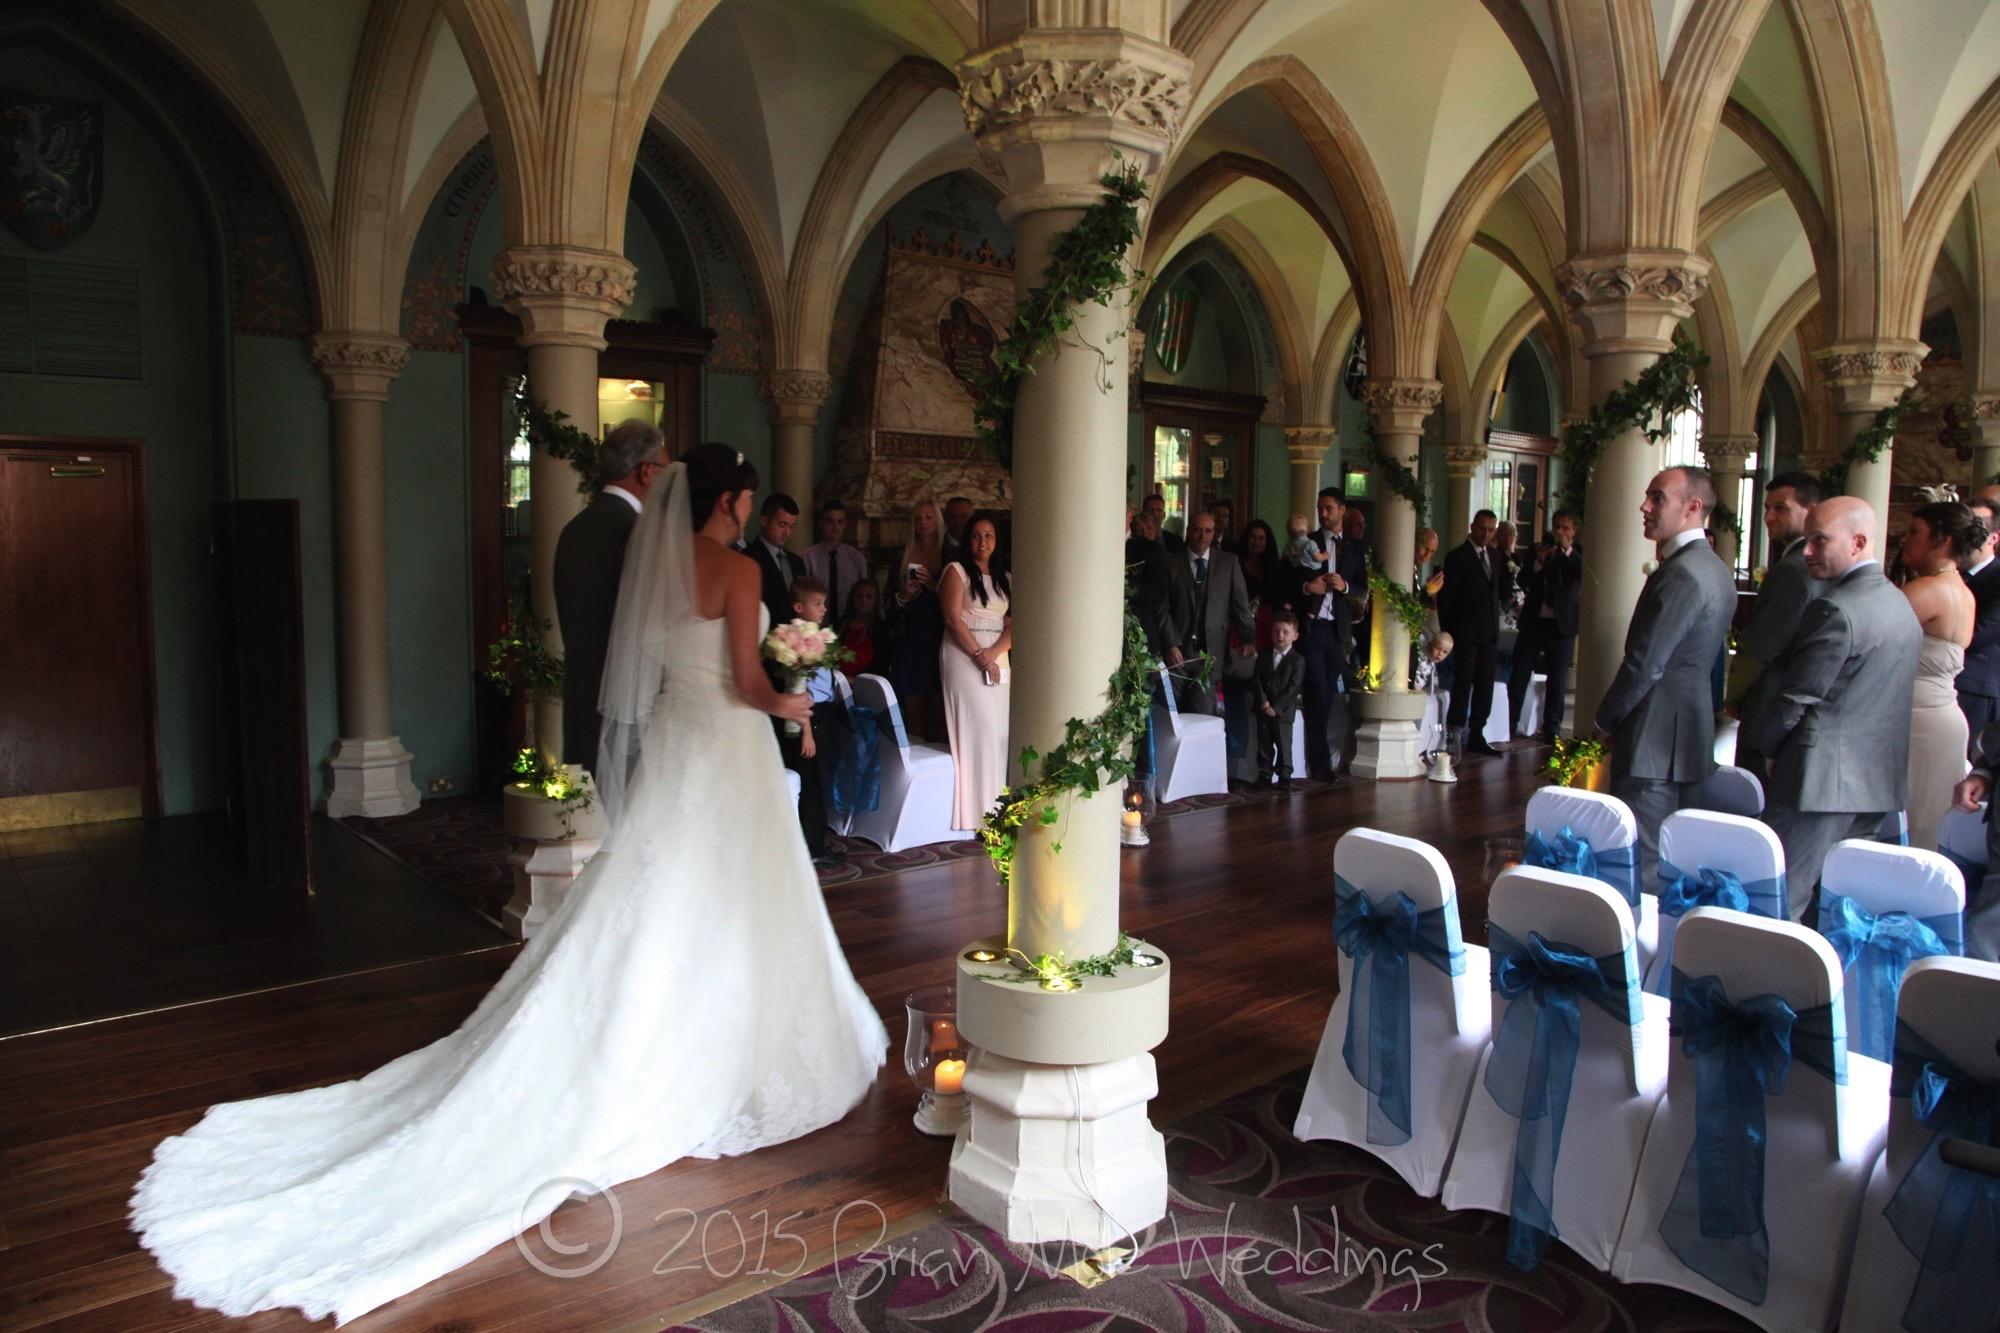 Wotton House A Fab Wedding Venue Set In The Surrey Hills